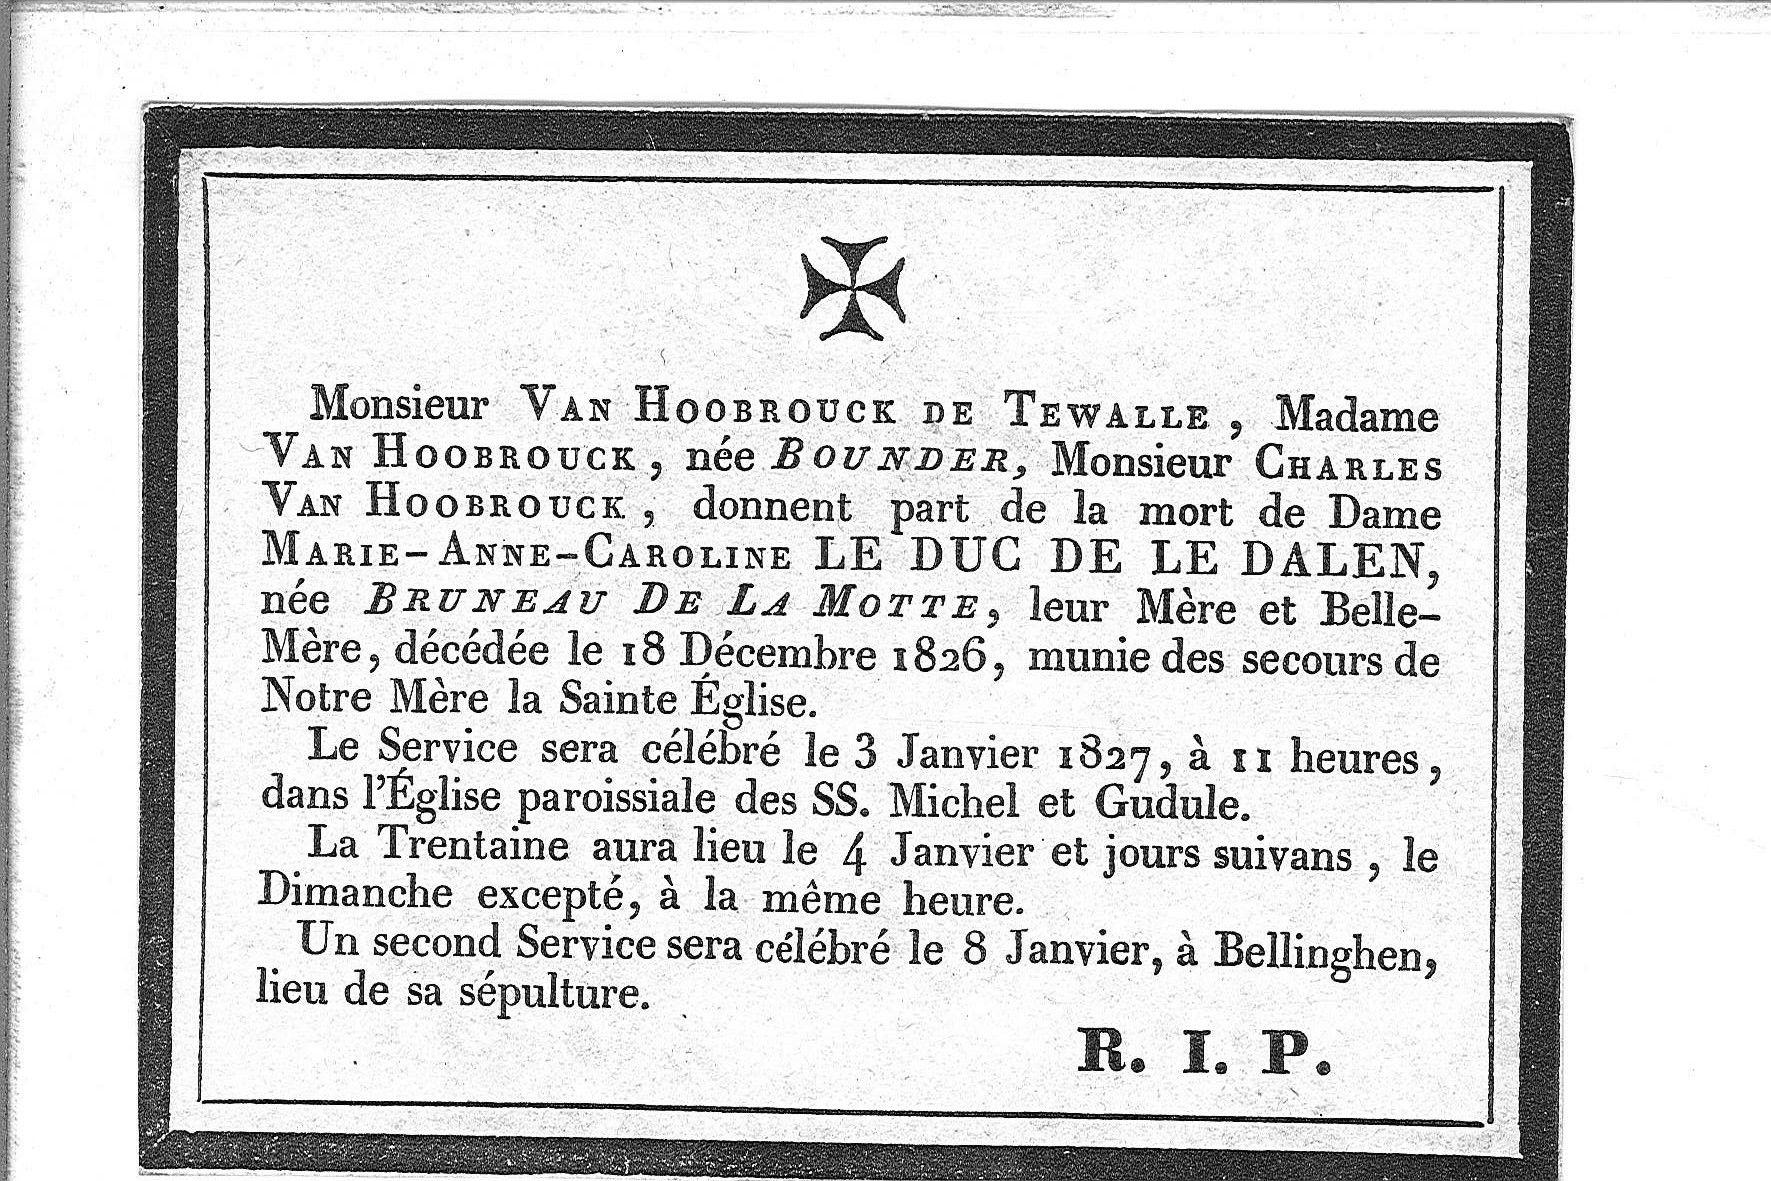 Marie-Anne-Caroline-(1826)-20121031101435_00072.jpg